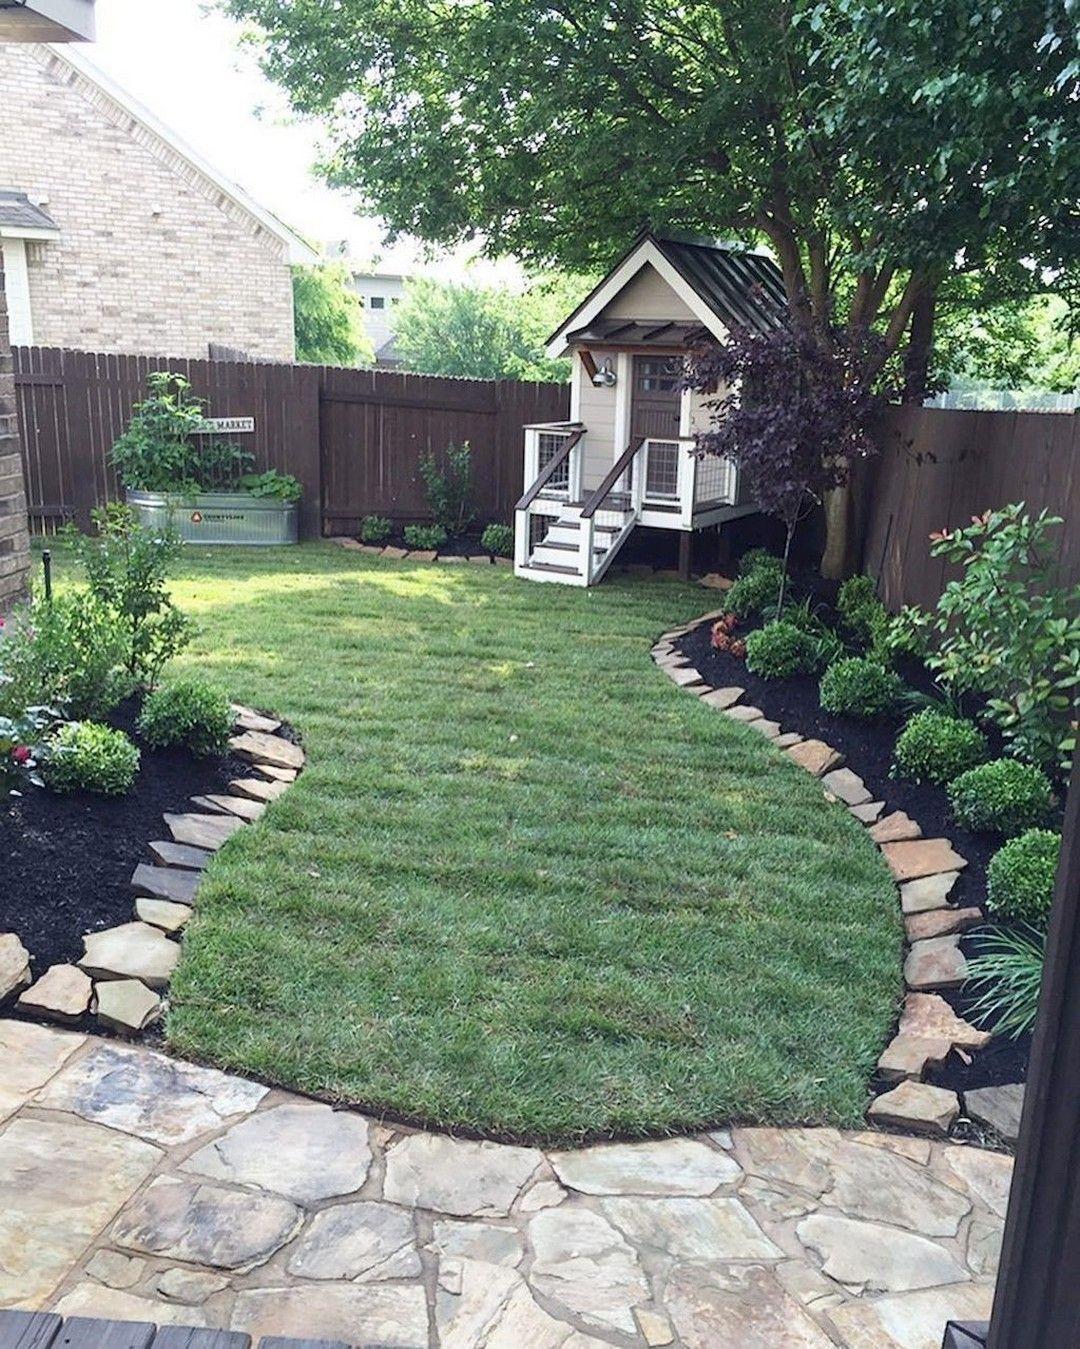 40 Backyard Oasis Design That Make Your Garden More Wonderfull Farmhouse Landscaping Backyard Backyard Garden Design